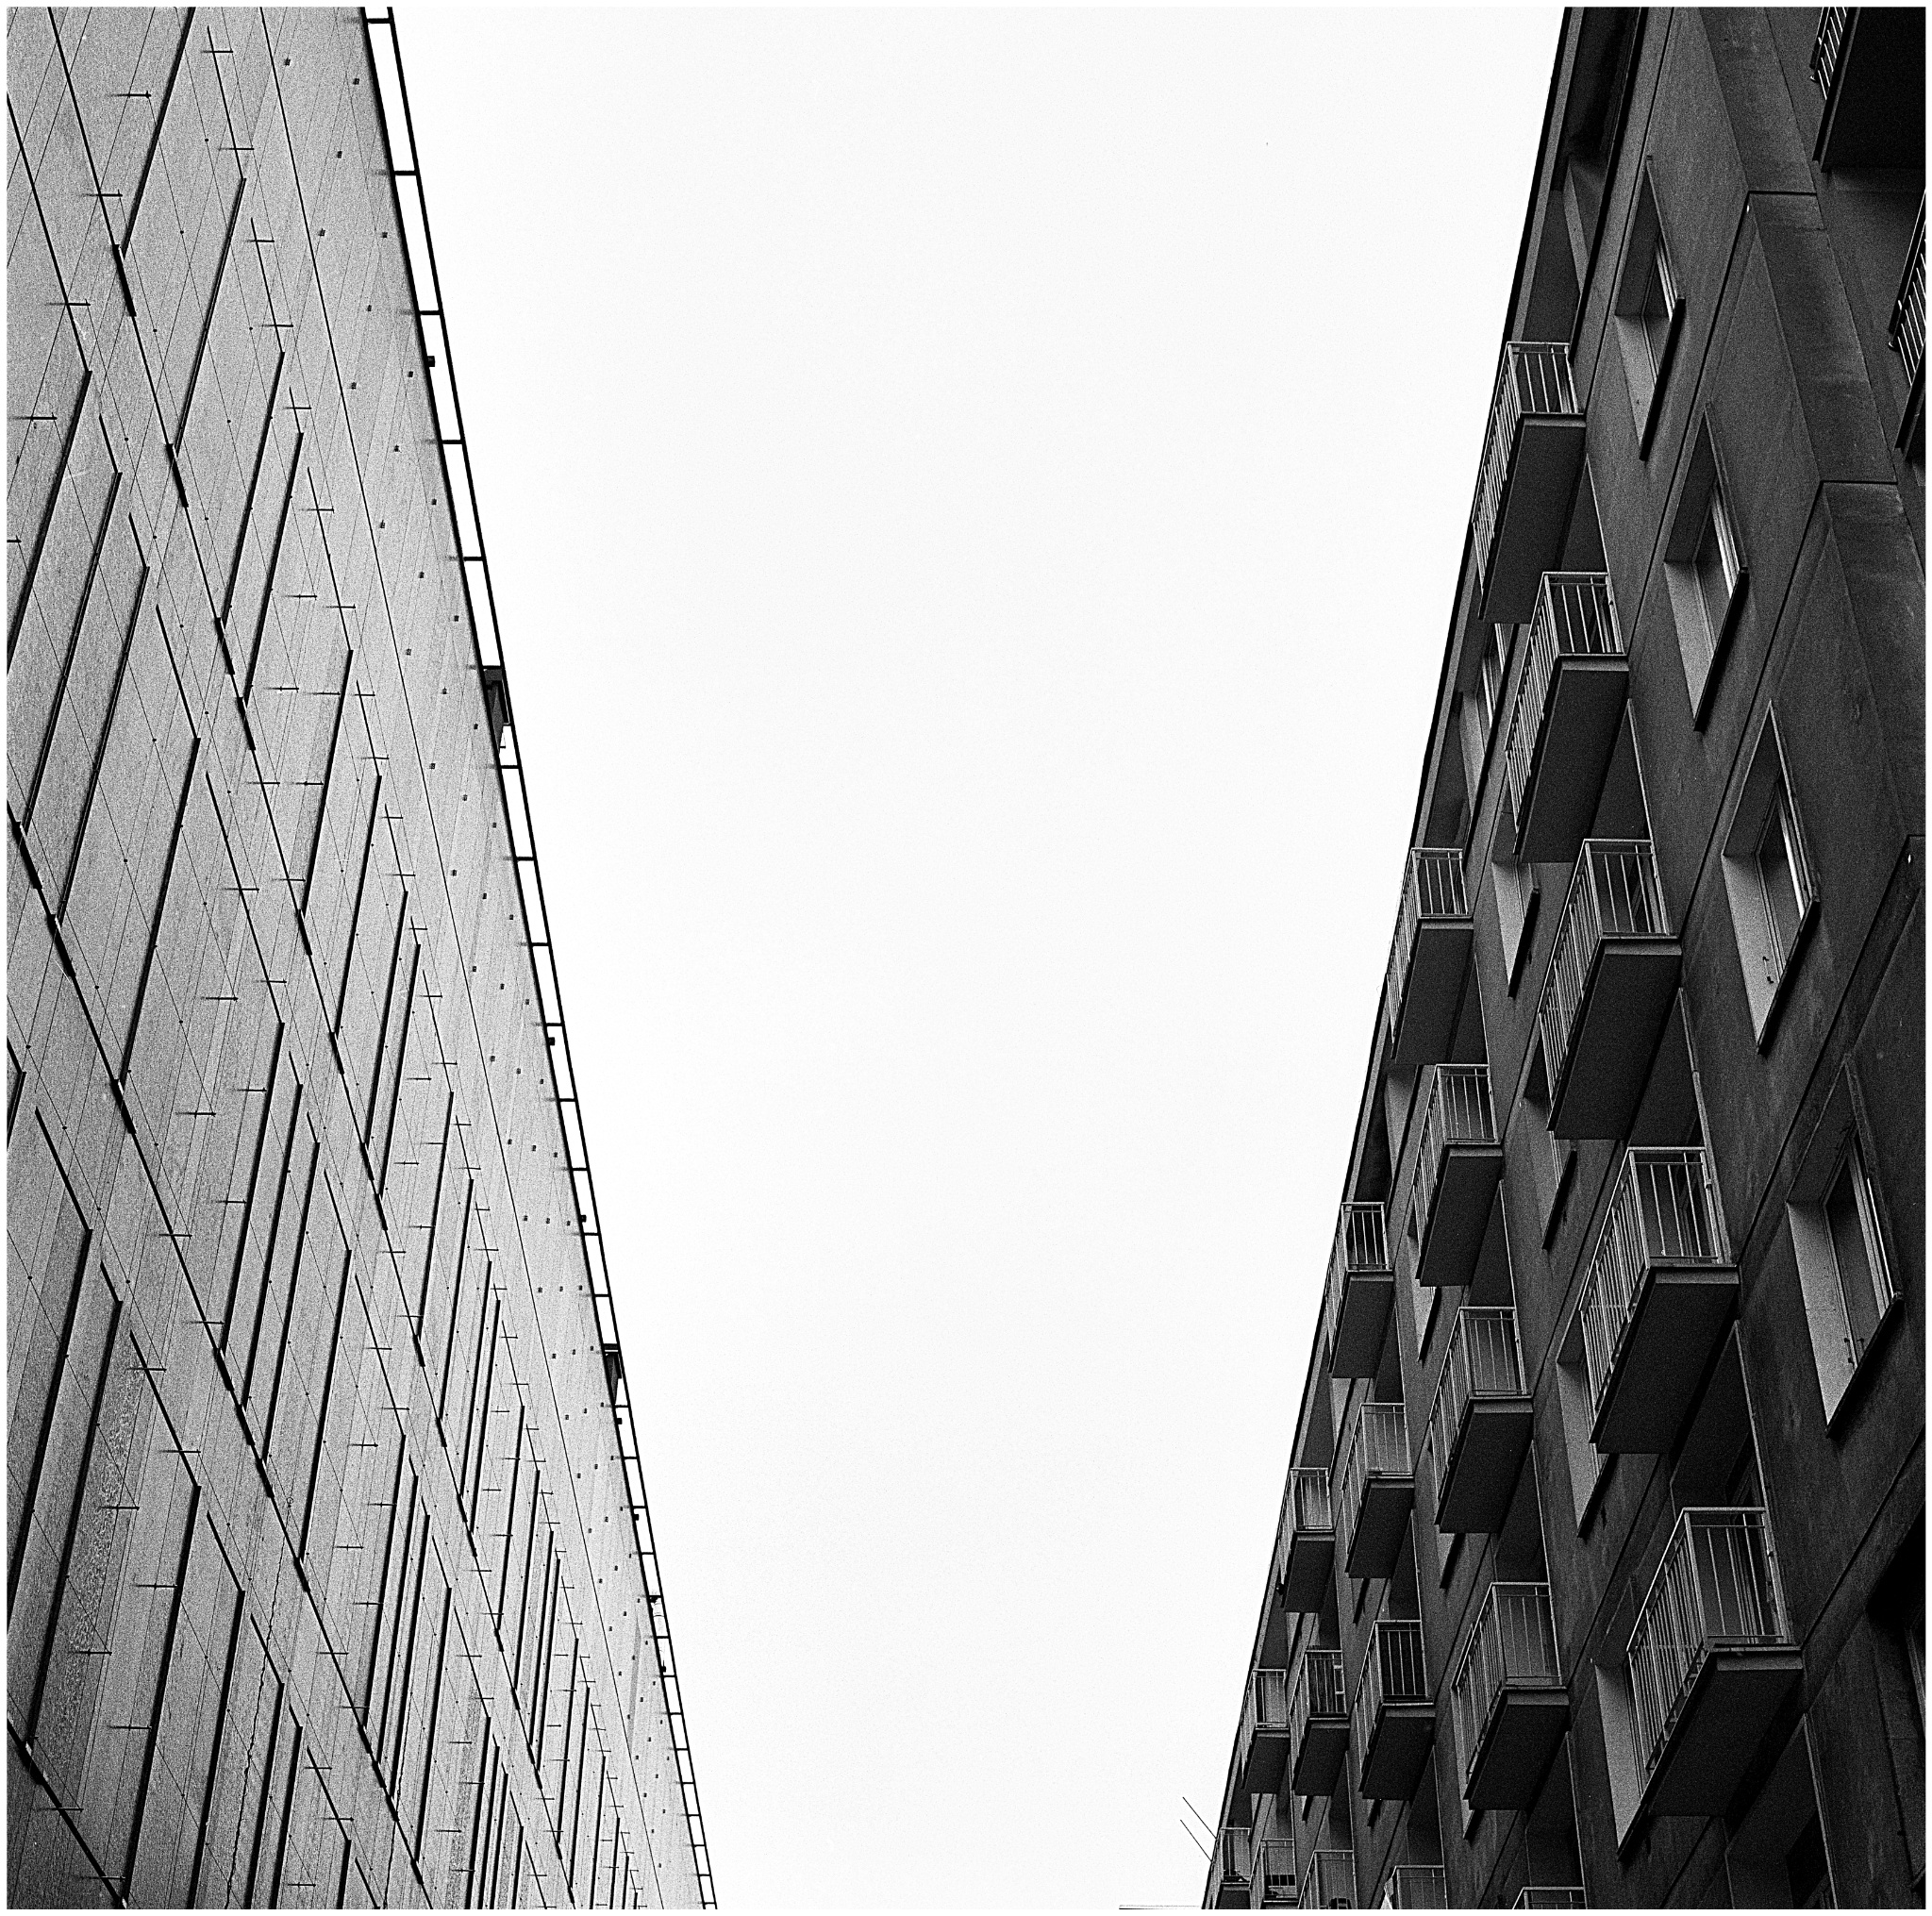 hasselblad_img262_Snapseed.jpg